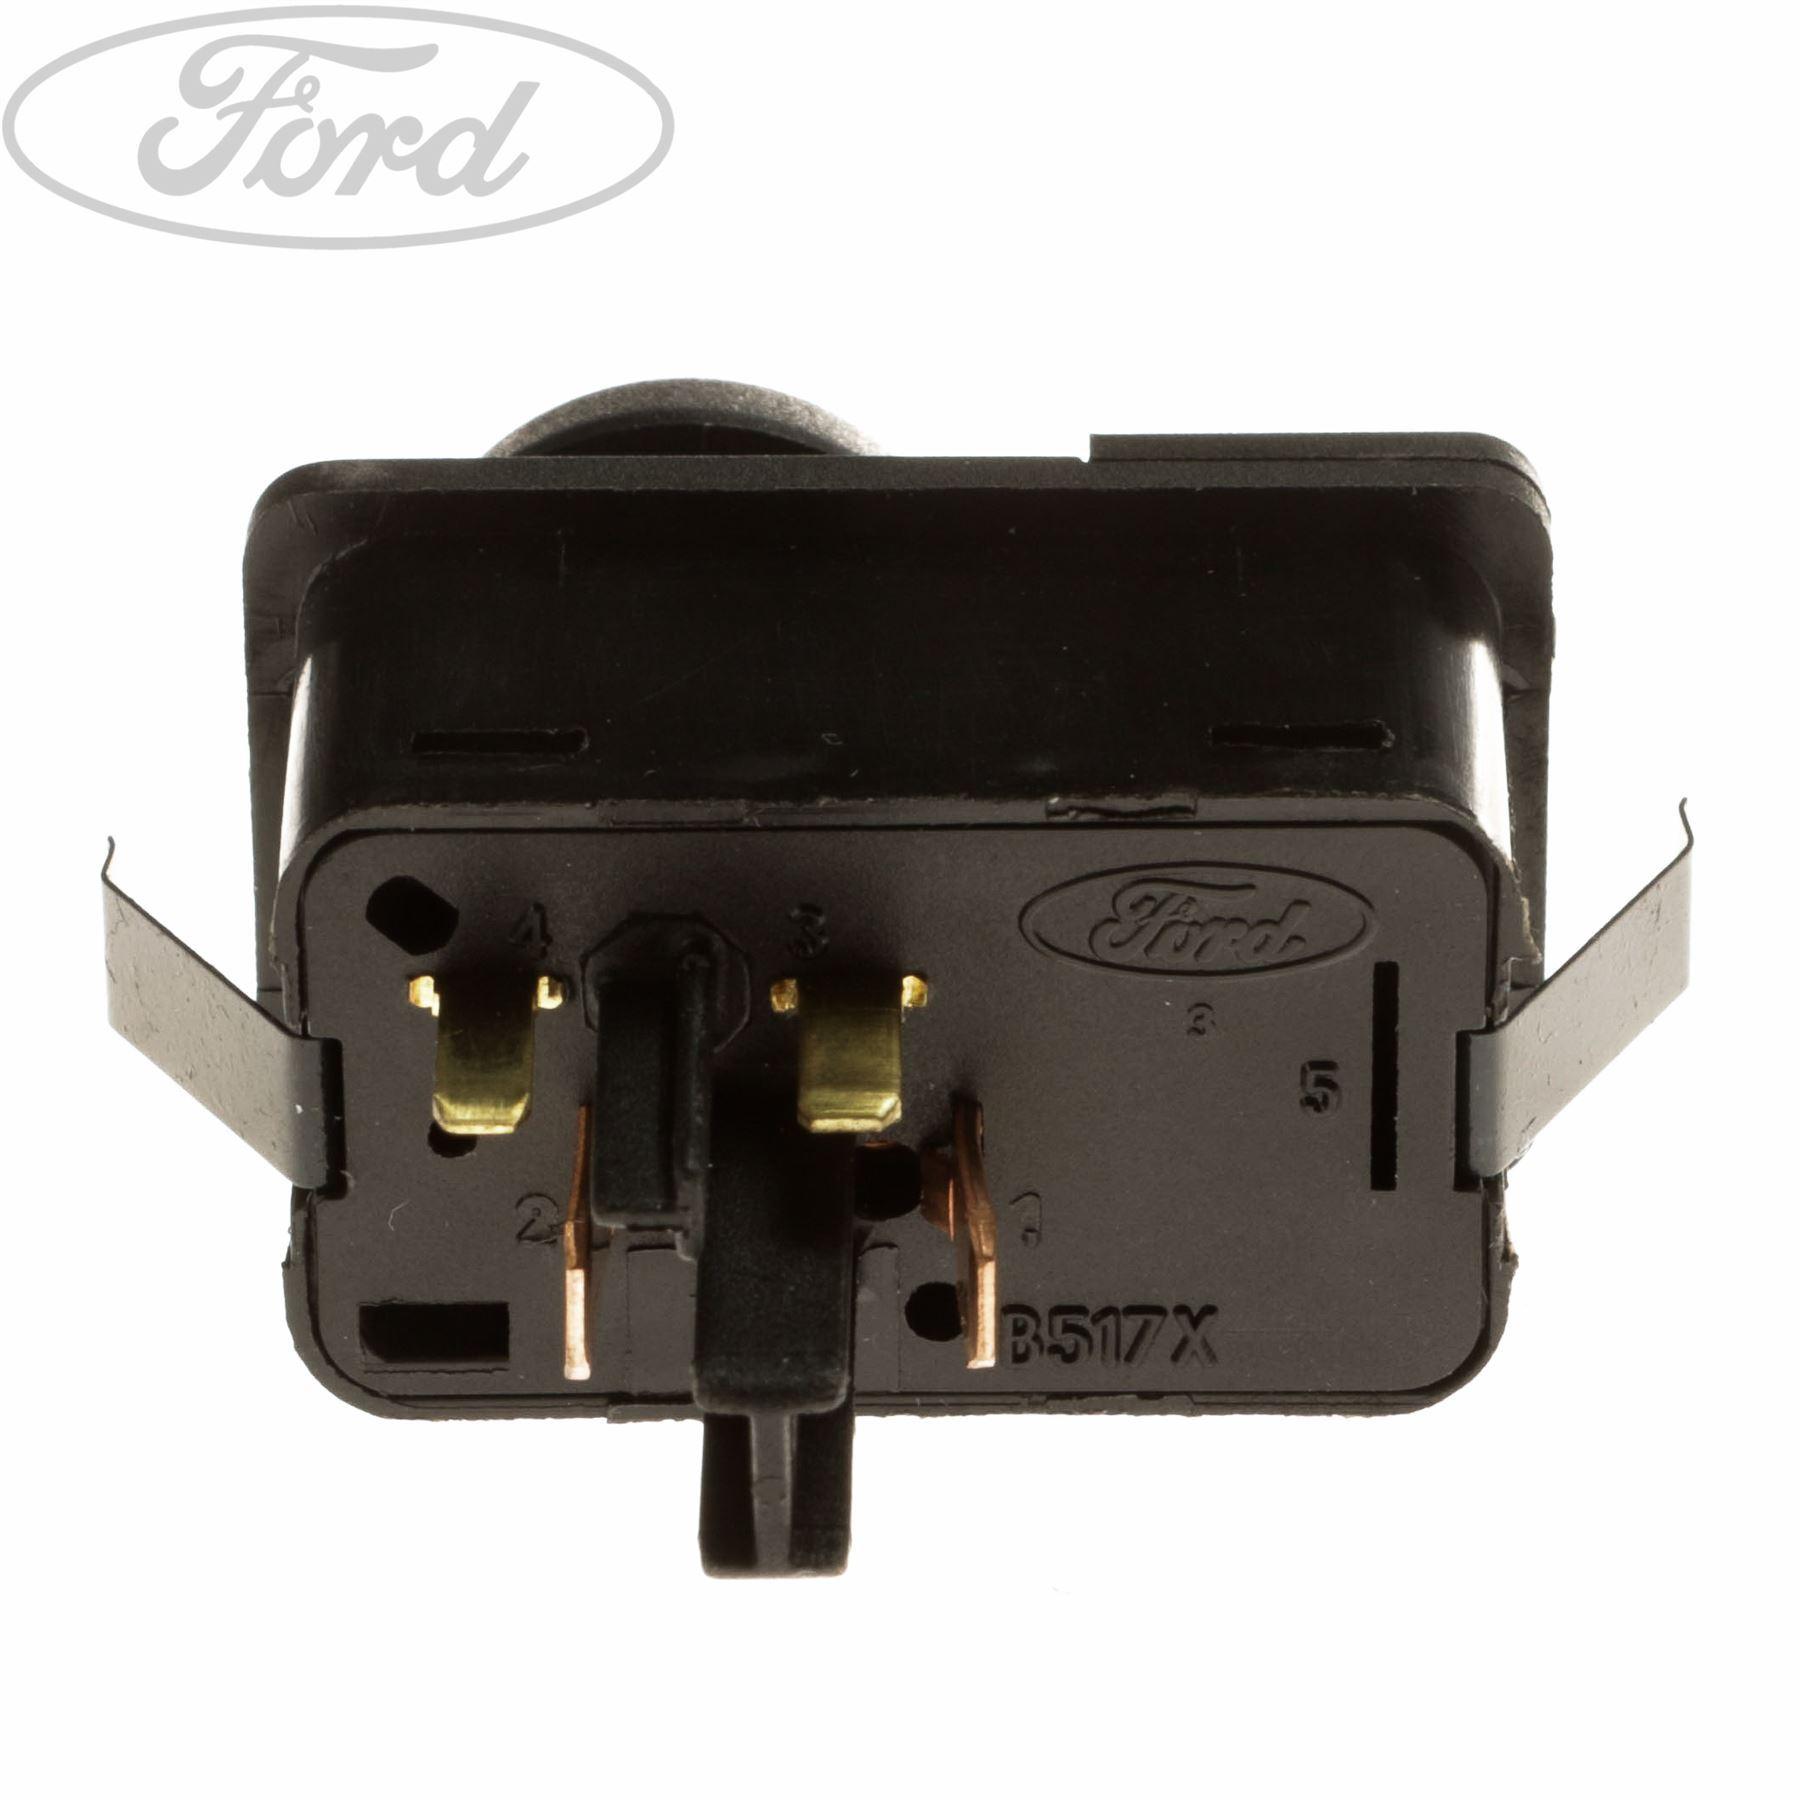 NEW Ford Fiesta COURTESY LIGHT SWITCH Door Light also for Capri Granada Corsa